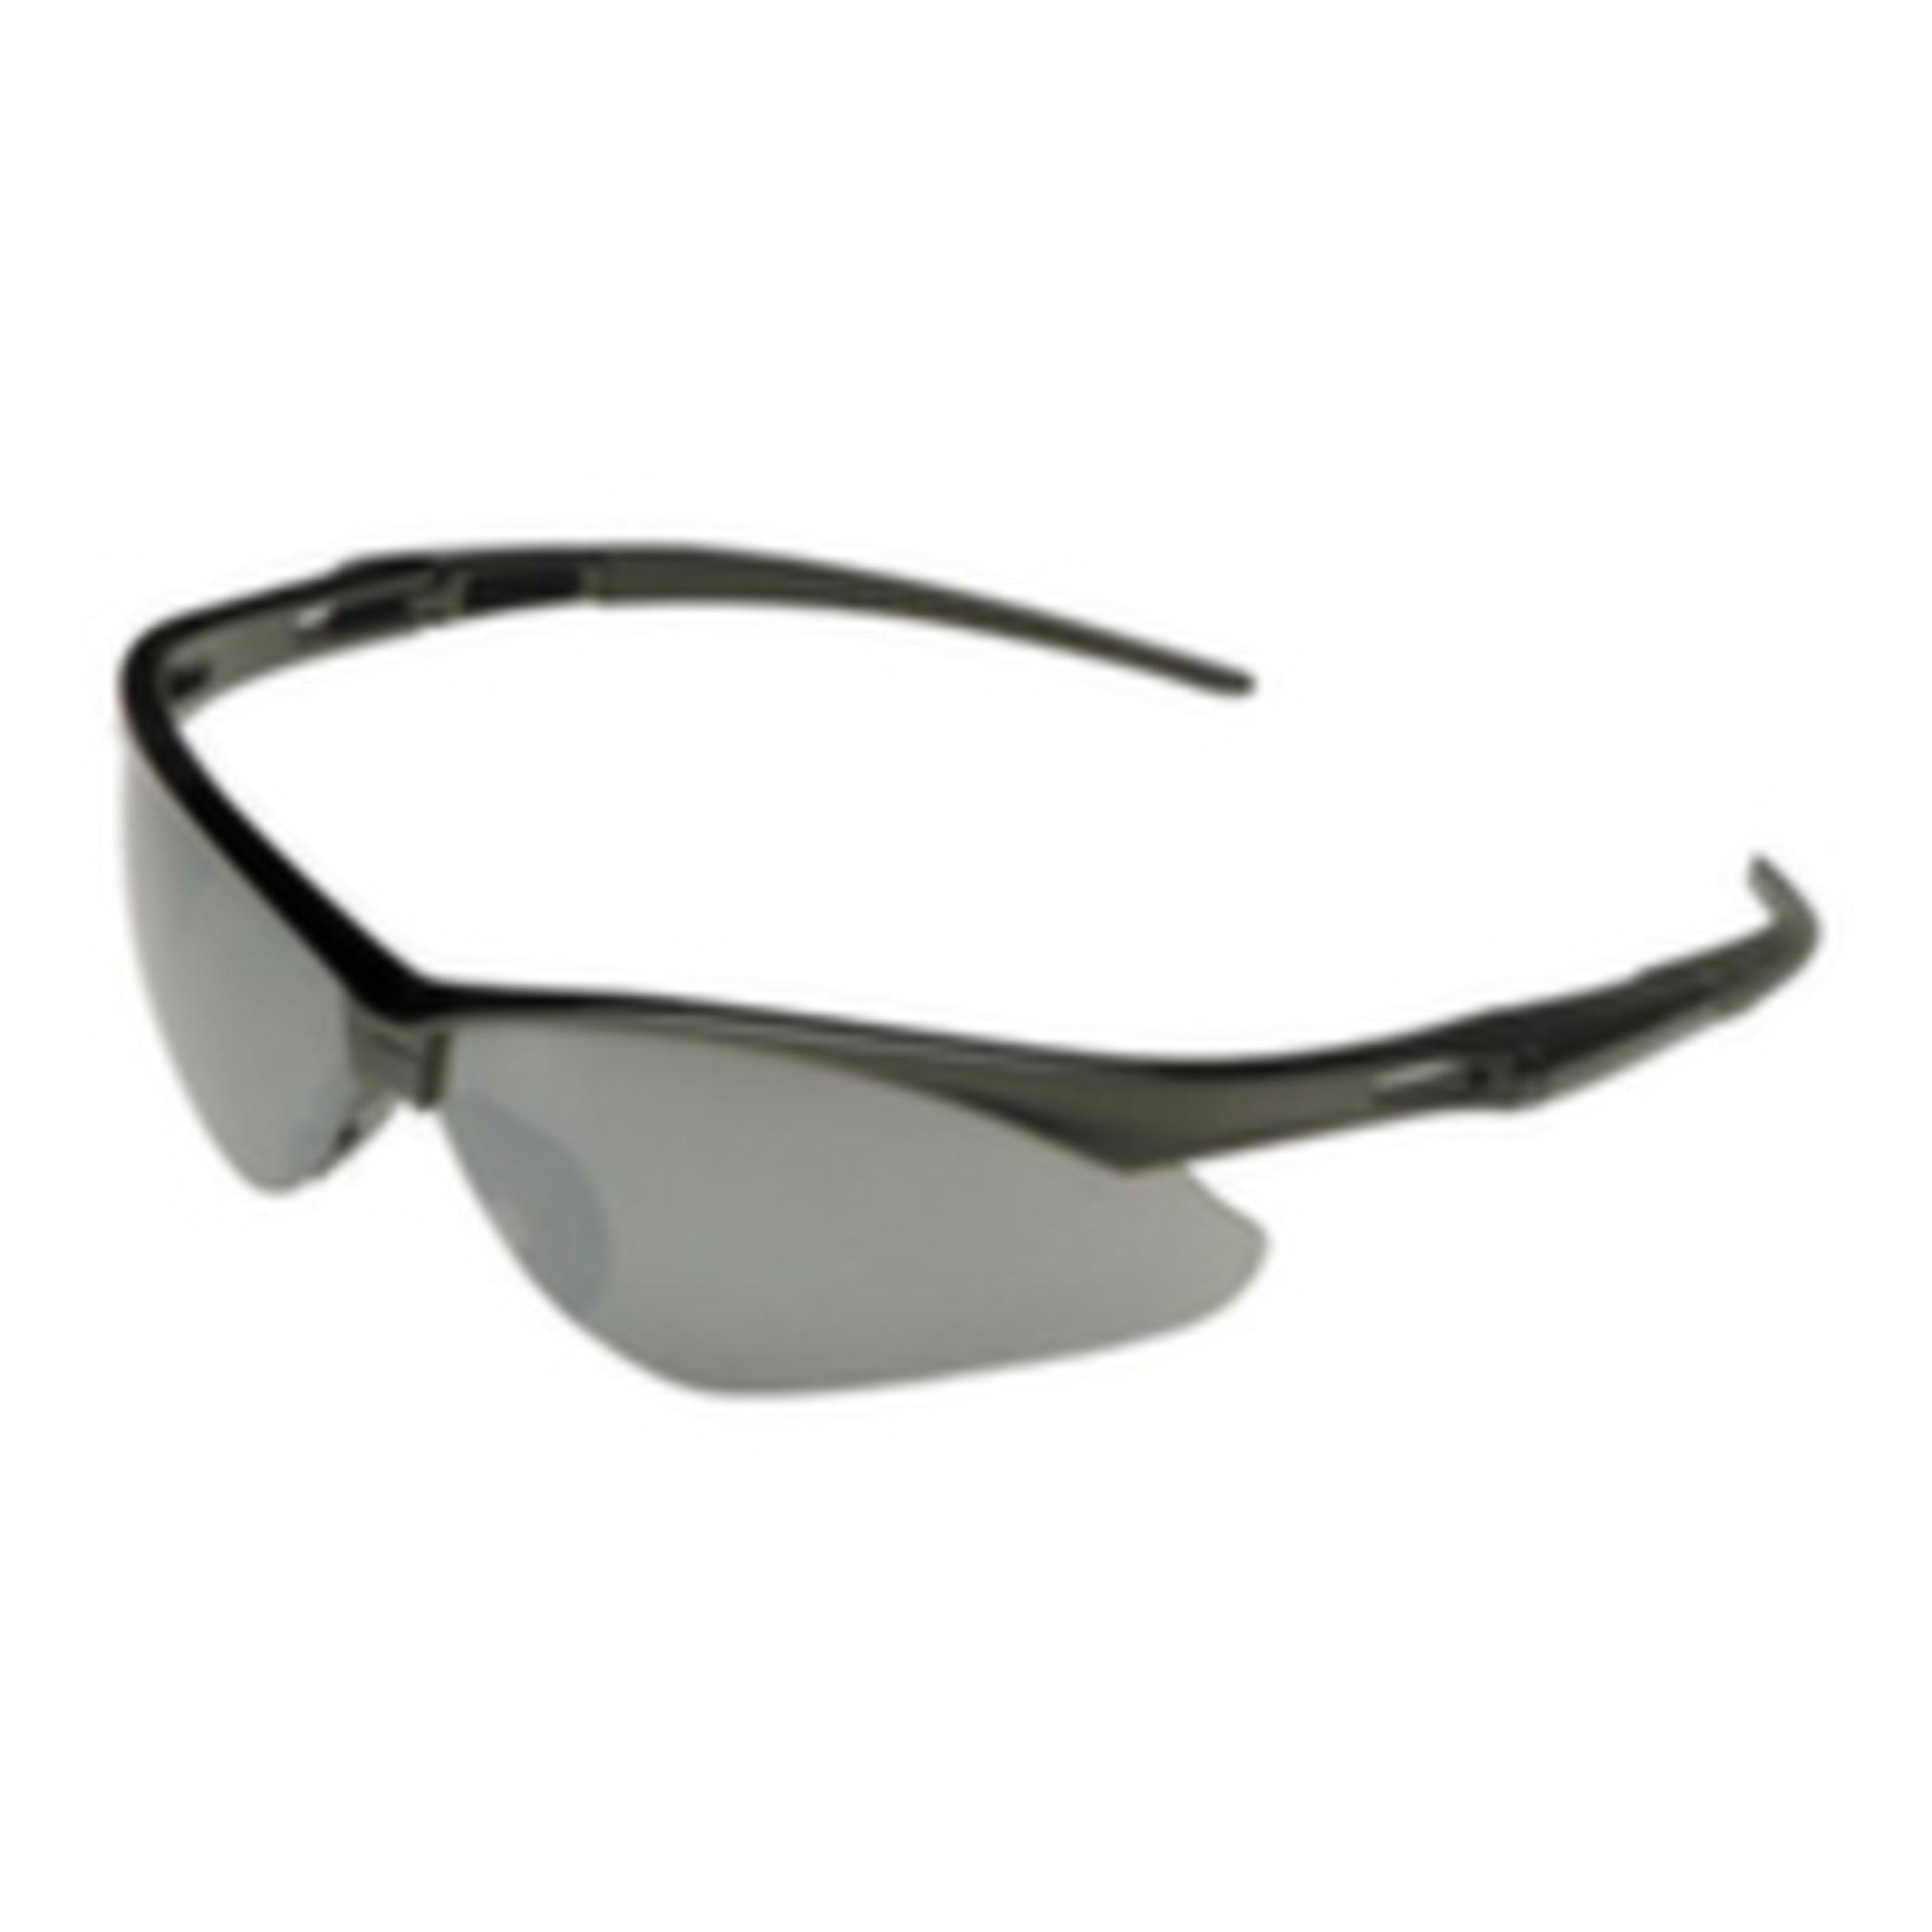 Jackson Safety V30 Nemesis Safety Glasses (25688), Smoke Mirror with Black Frame, 12 Pairs / Case